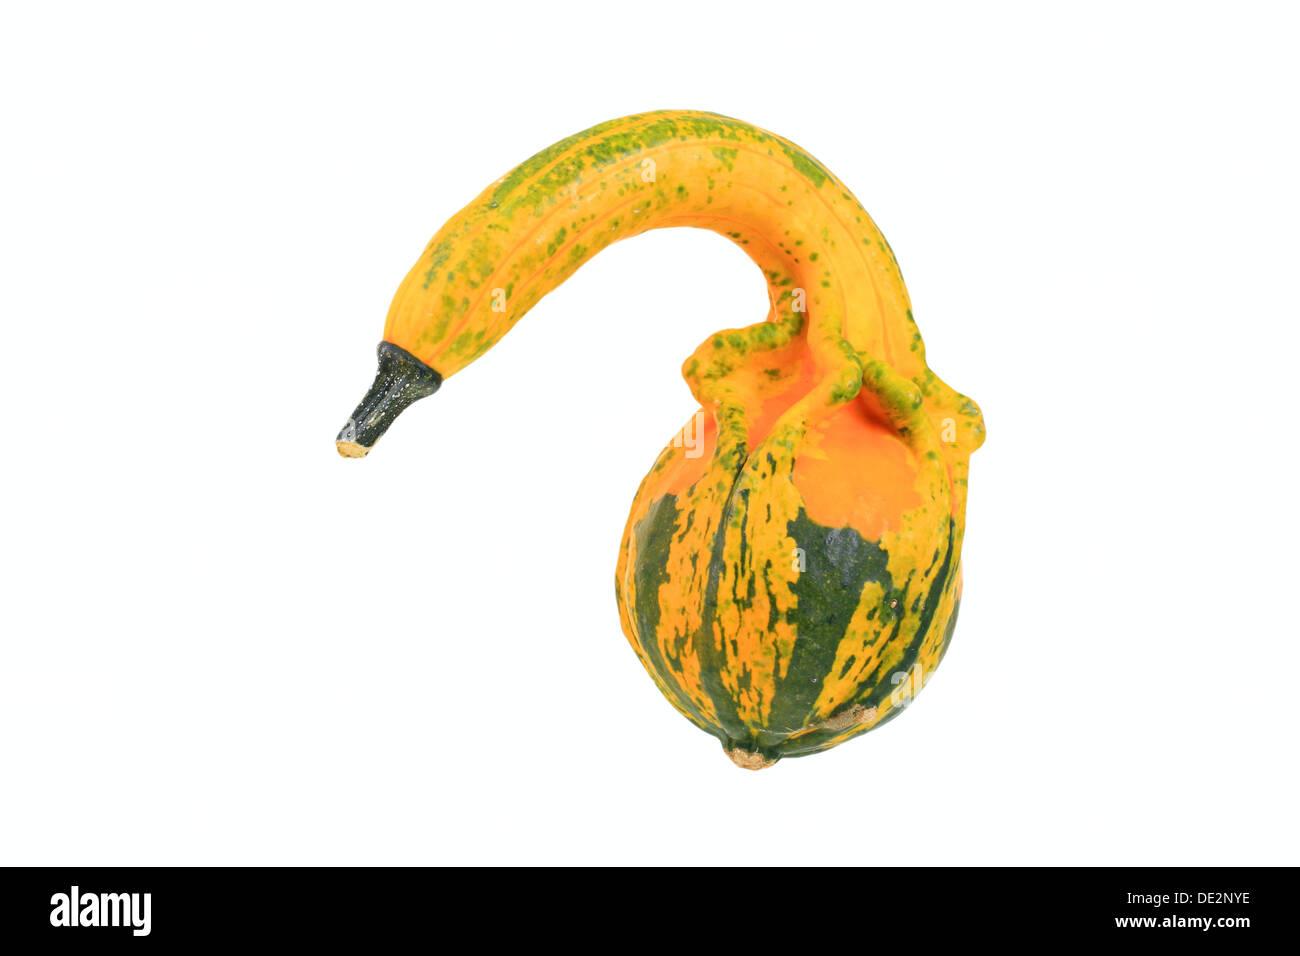 'Autumn Wings' or bottleneck gourd - Stock Image